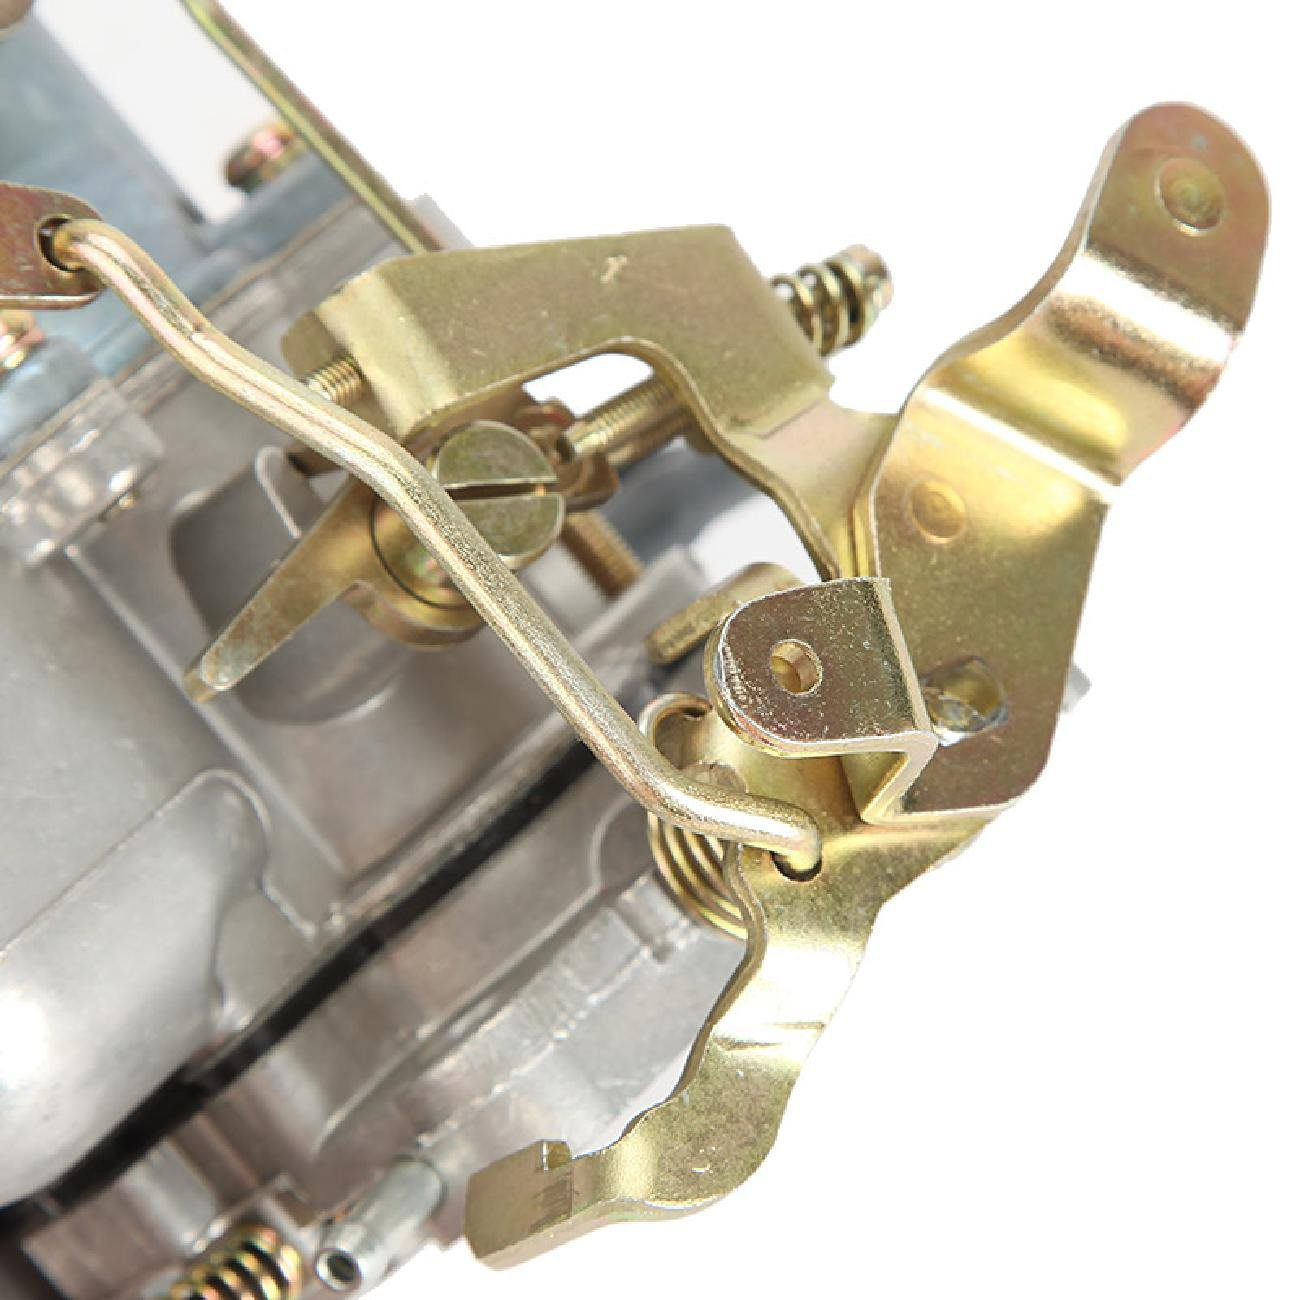 Amazon.com: ALAVENTE Carburetor Carb for Jeep BBD 6 CYL Engine 4.2 L 258 CU  Engine 1983-1988 (Automatic Choke): Automotive